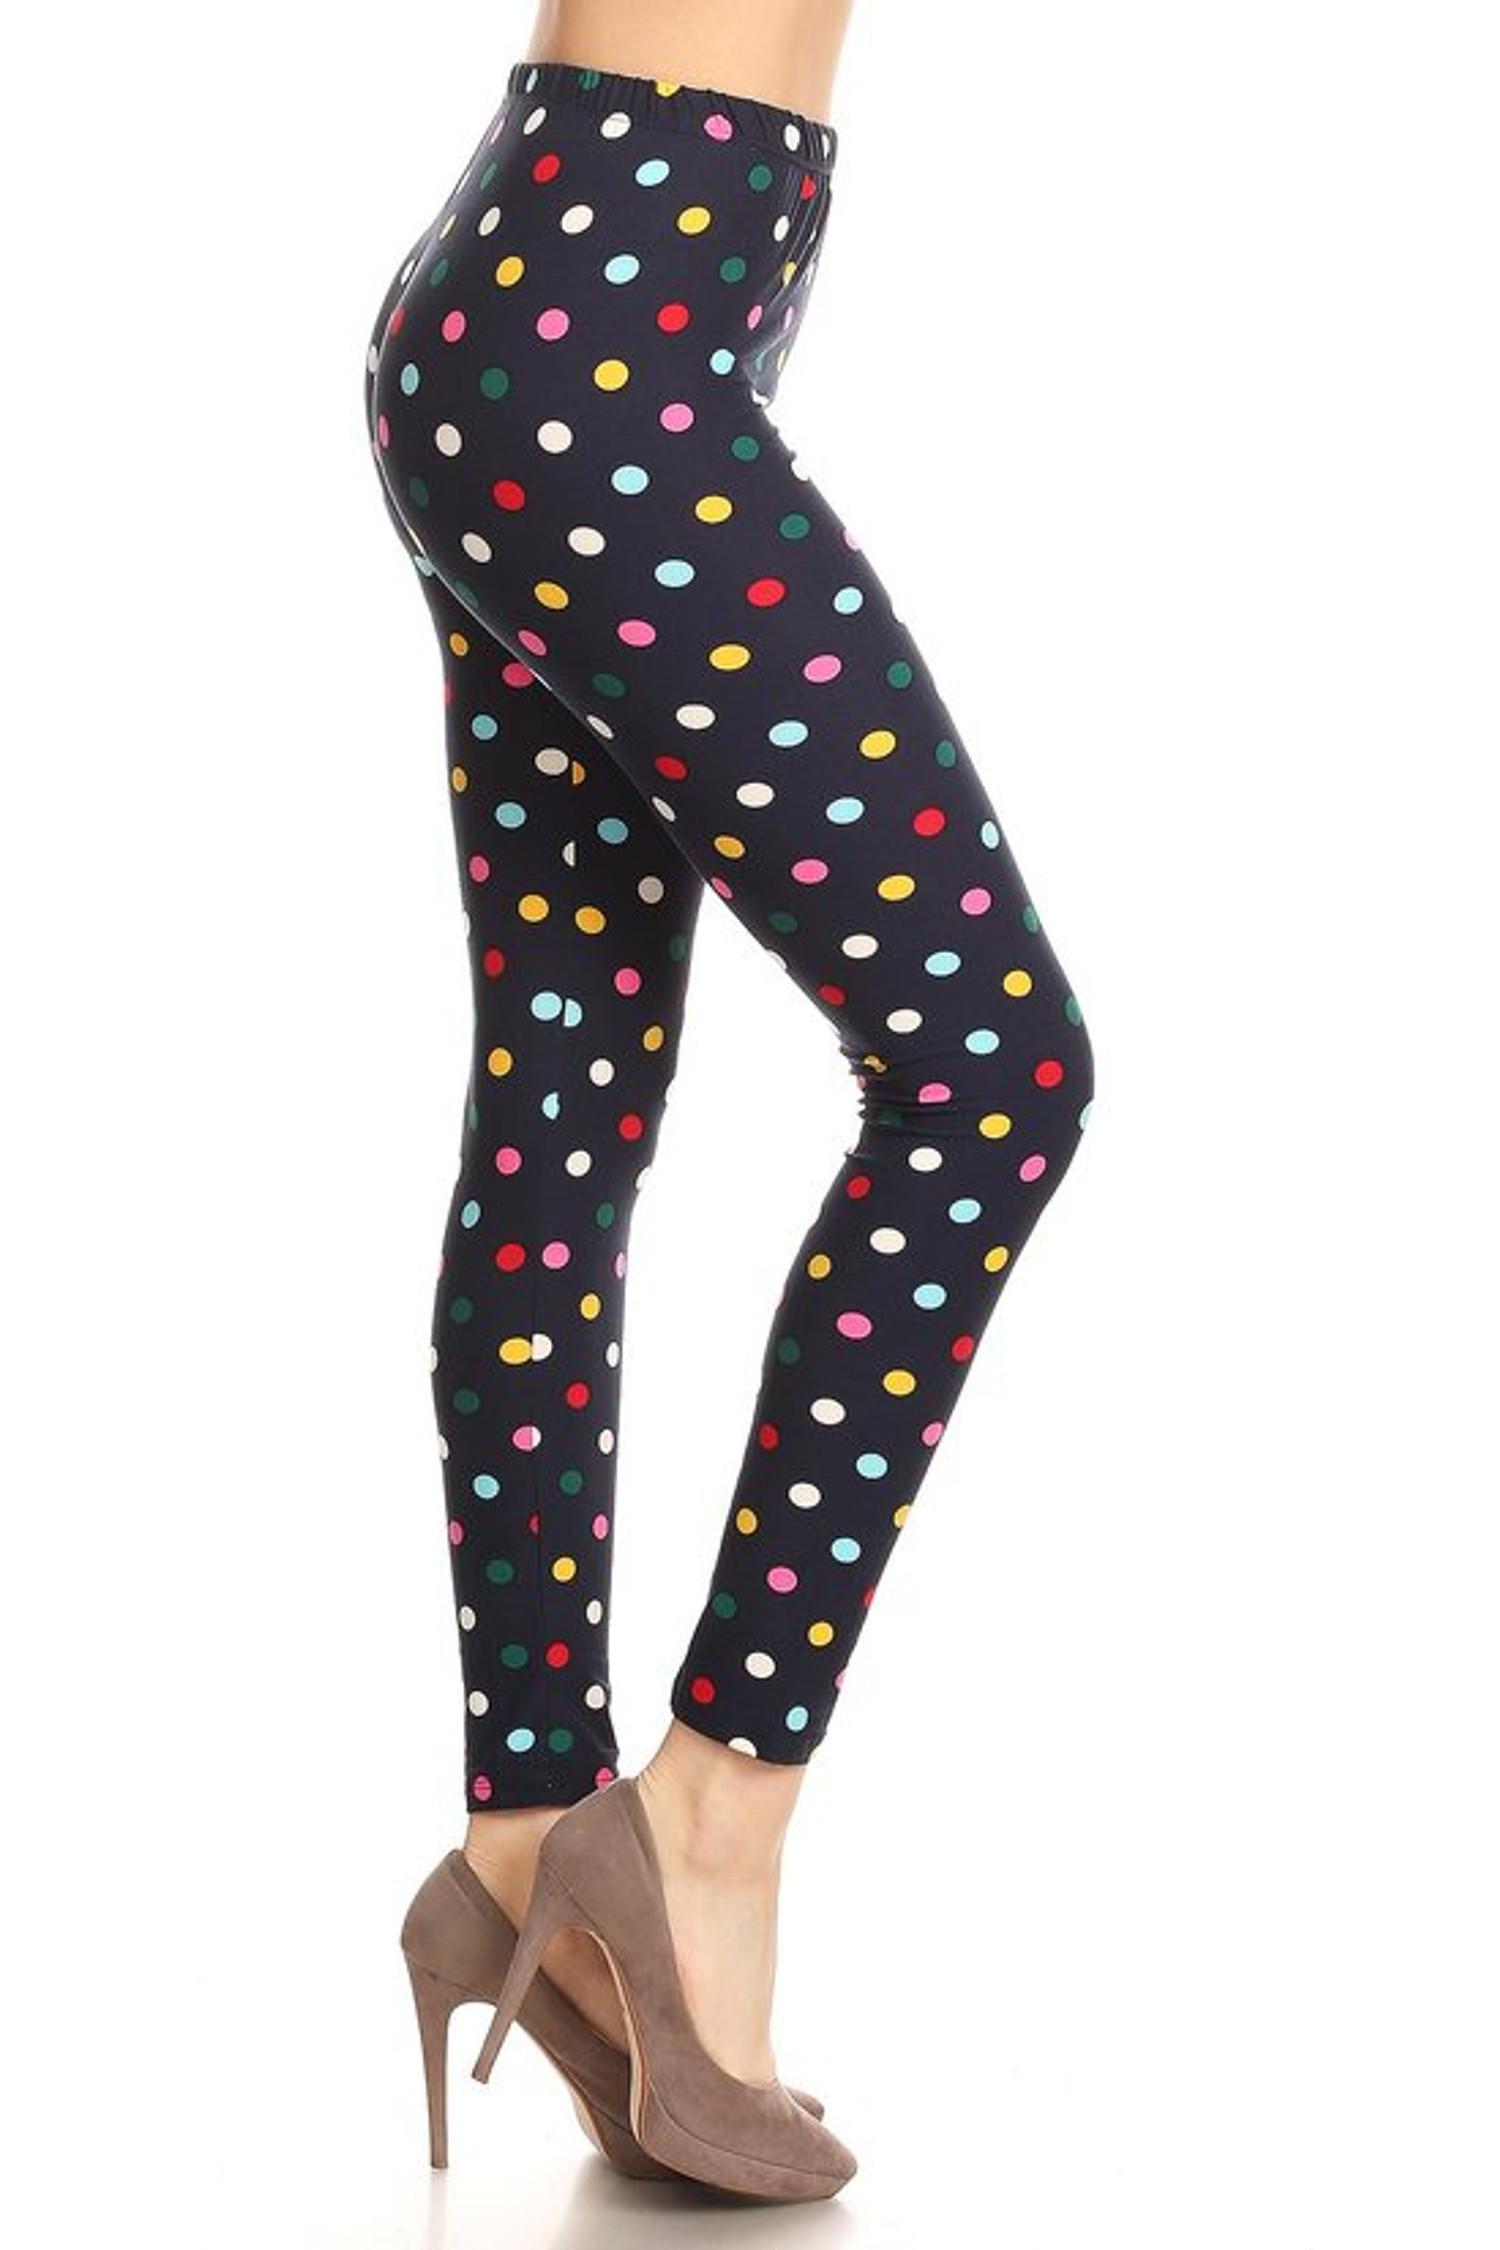 Soft Brushed Colorful Polka Dot Plus Size Leggings